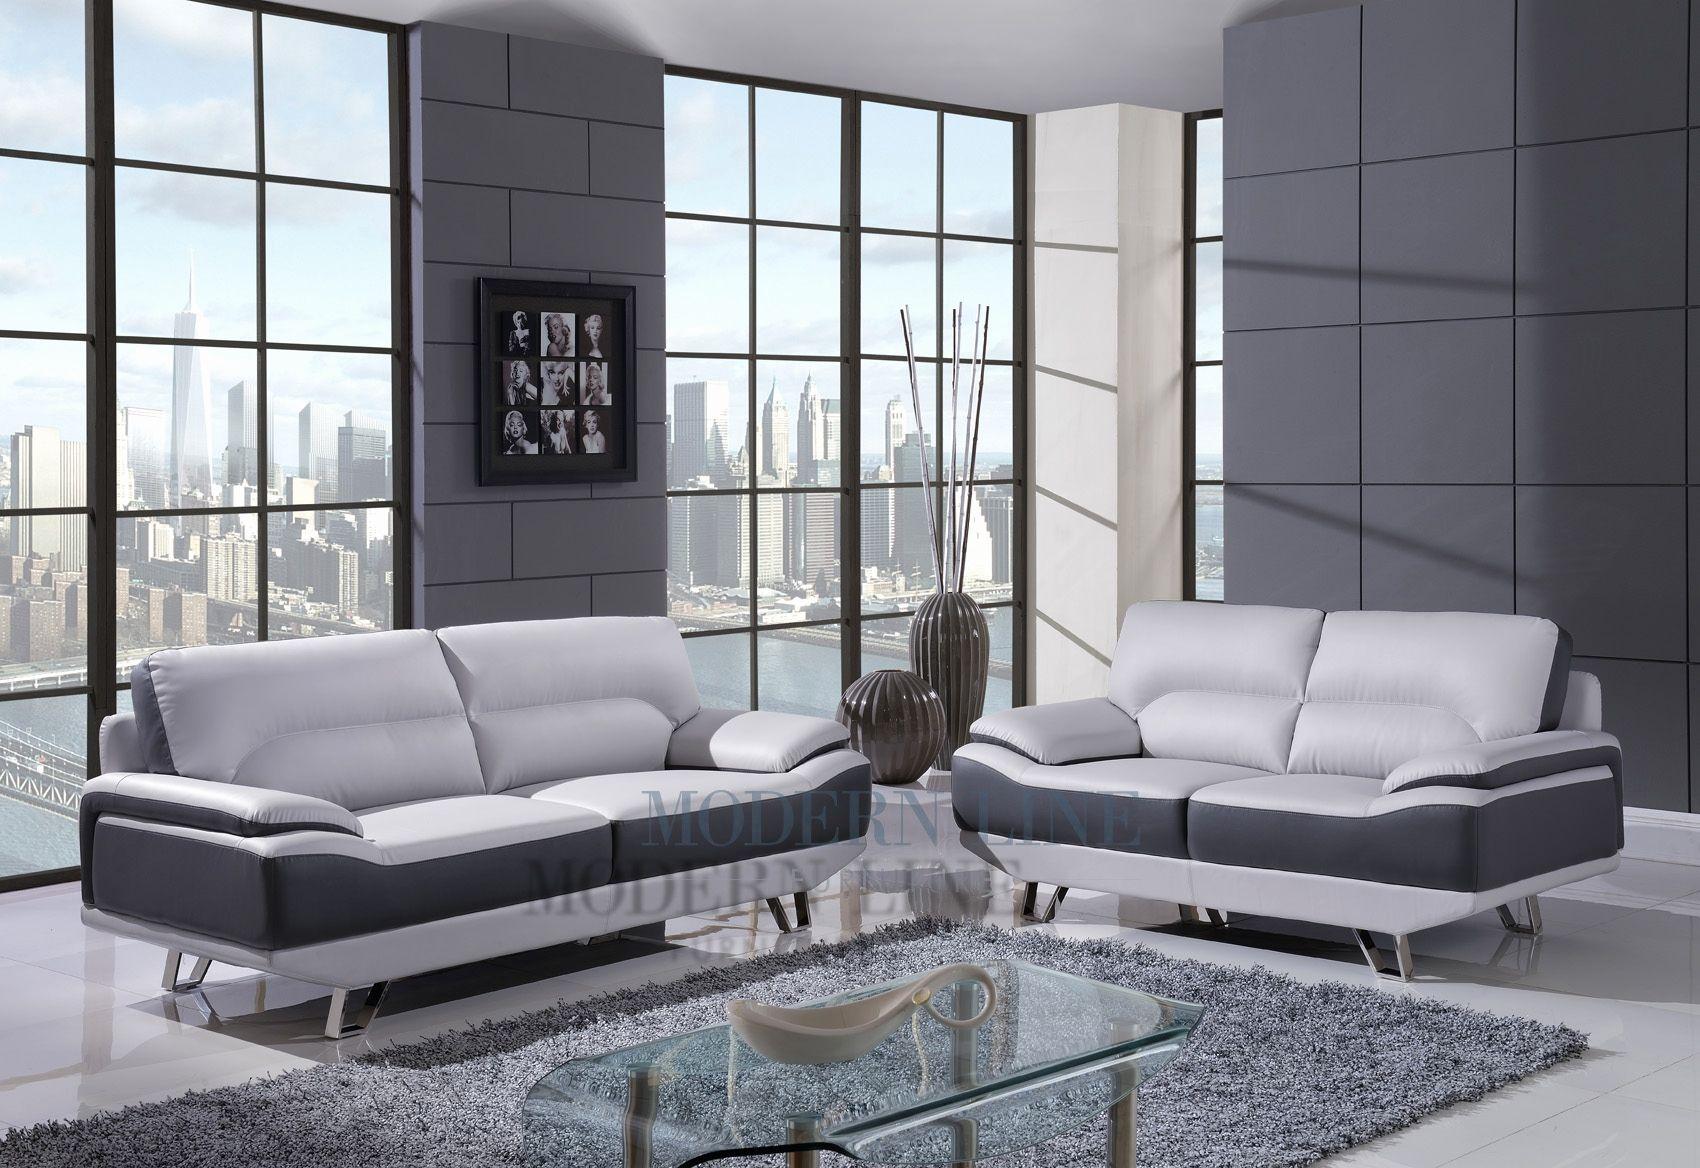 Best Of Modern Sofa Set Pictures Modern Dual Tone Light Grey Dark Leather Living Roo Modern Grey Sofa Living Room Grey Sofa Living Room Modern Grey Living Room